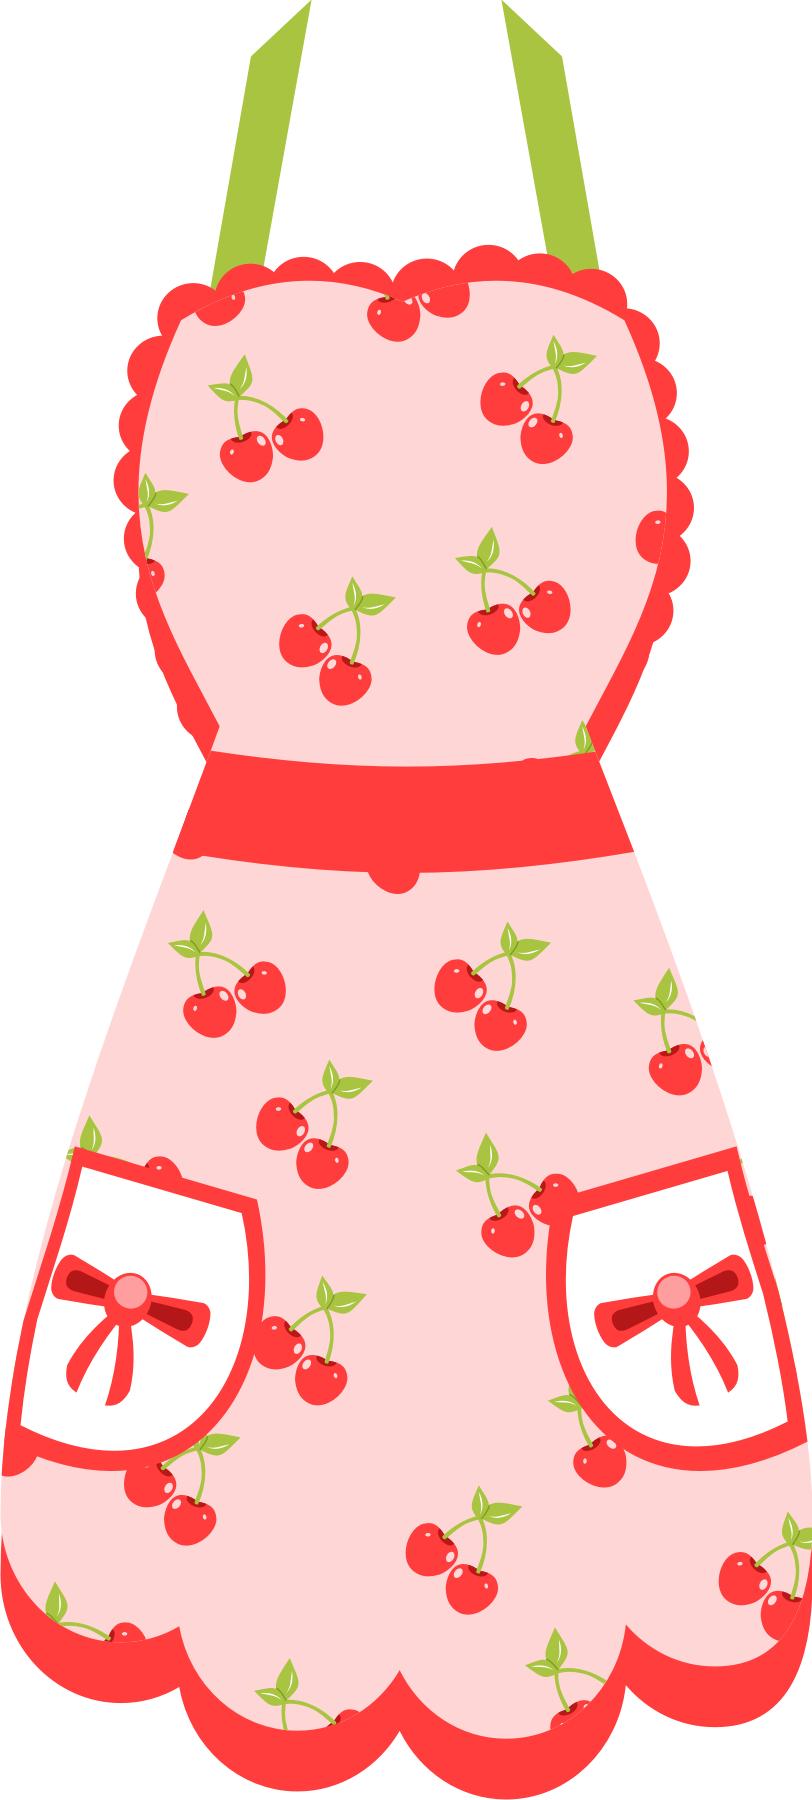 Frosting clipart pink apron More Pin Objetos Clip @danimfalcao